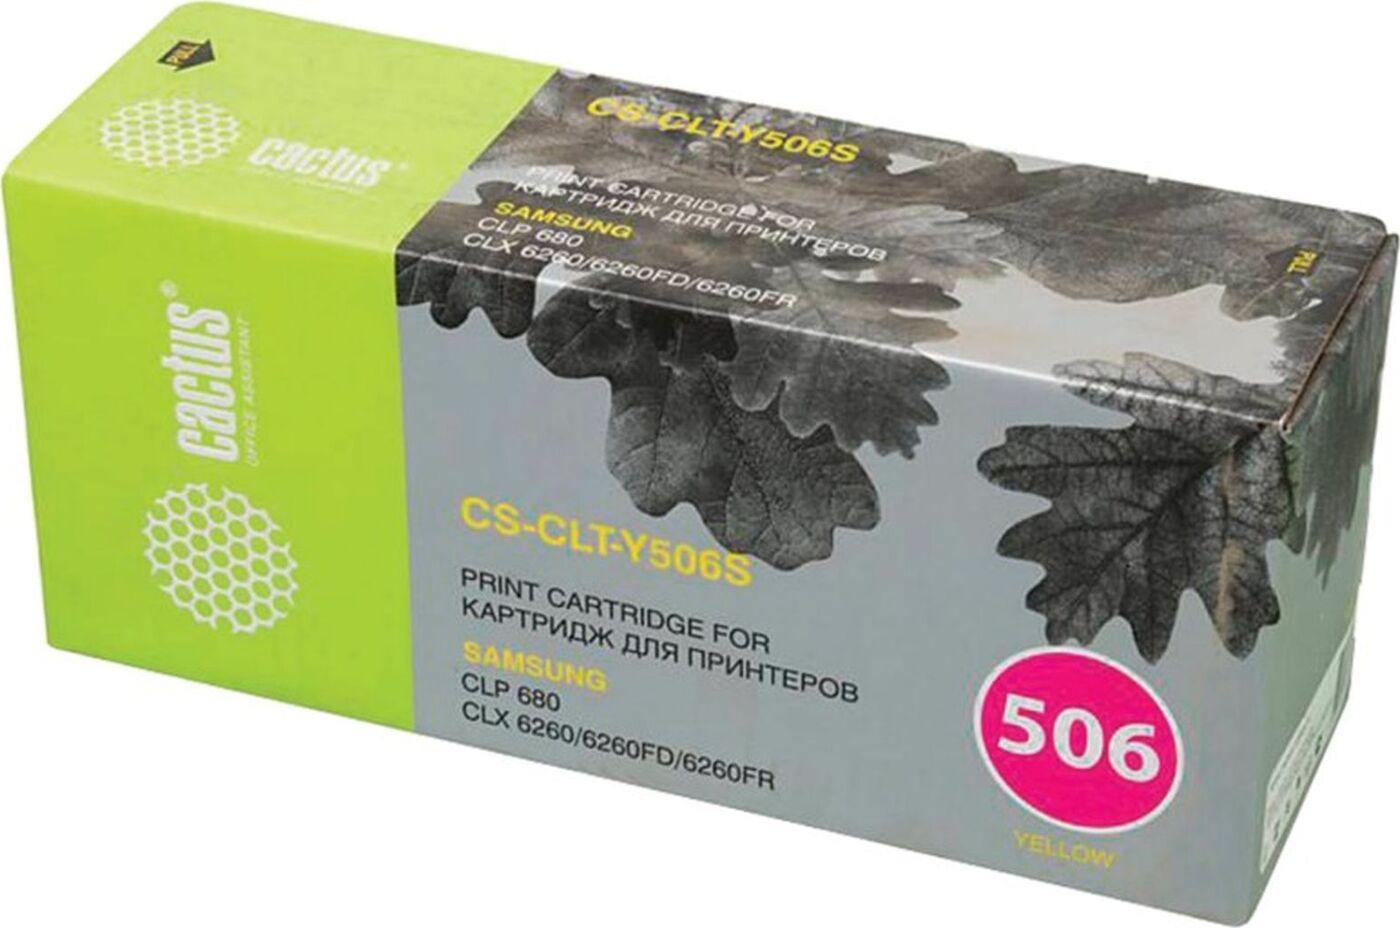 Тонер-картридж Cactus CS-CLT-Y506LV для Samsung CLP 680/CLX 6260/6260FD/6260FR, желтый картридж samsung clt m506l для samsung clp 680 clx 6260 пурпурный